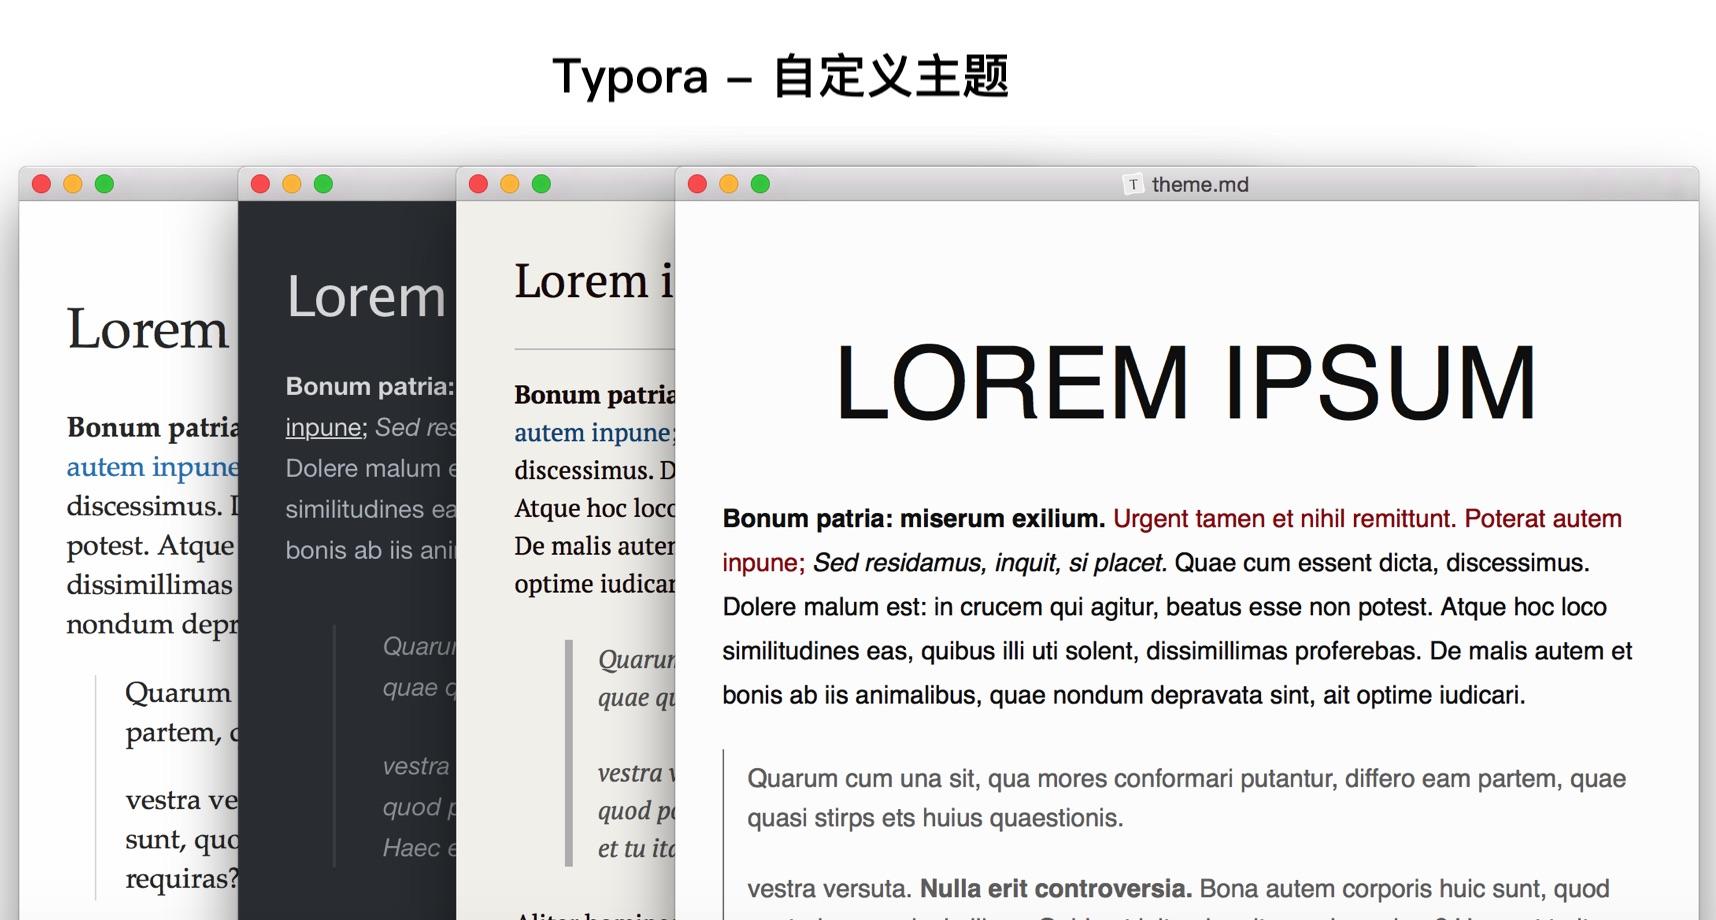 Typora - 自定义主题